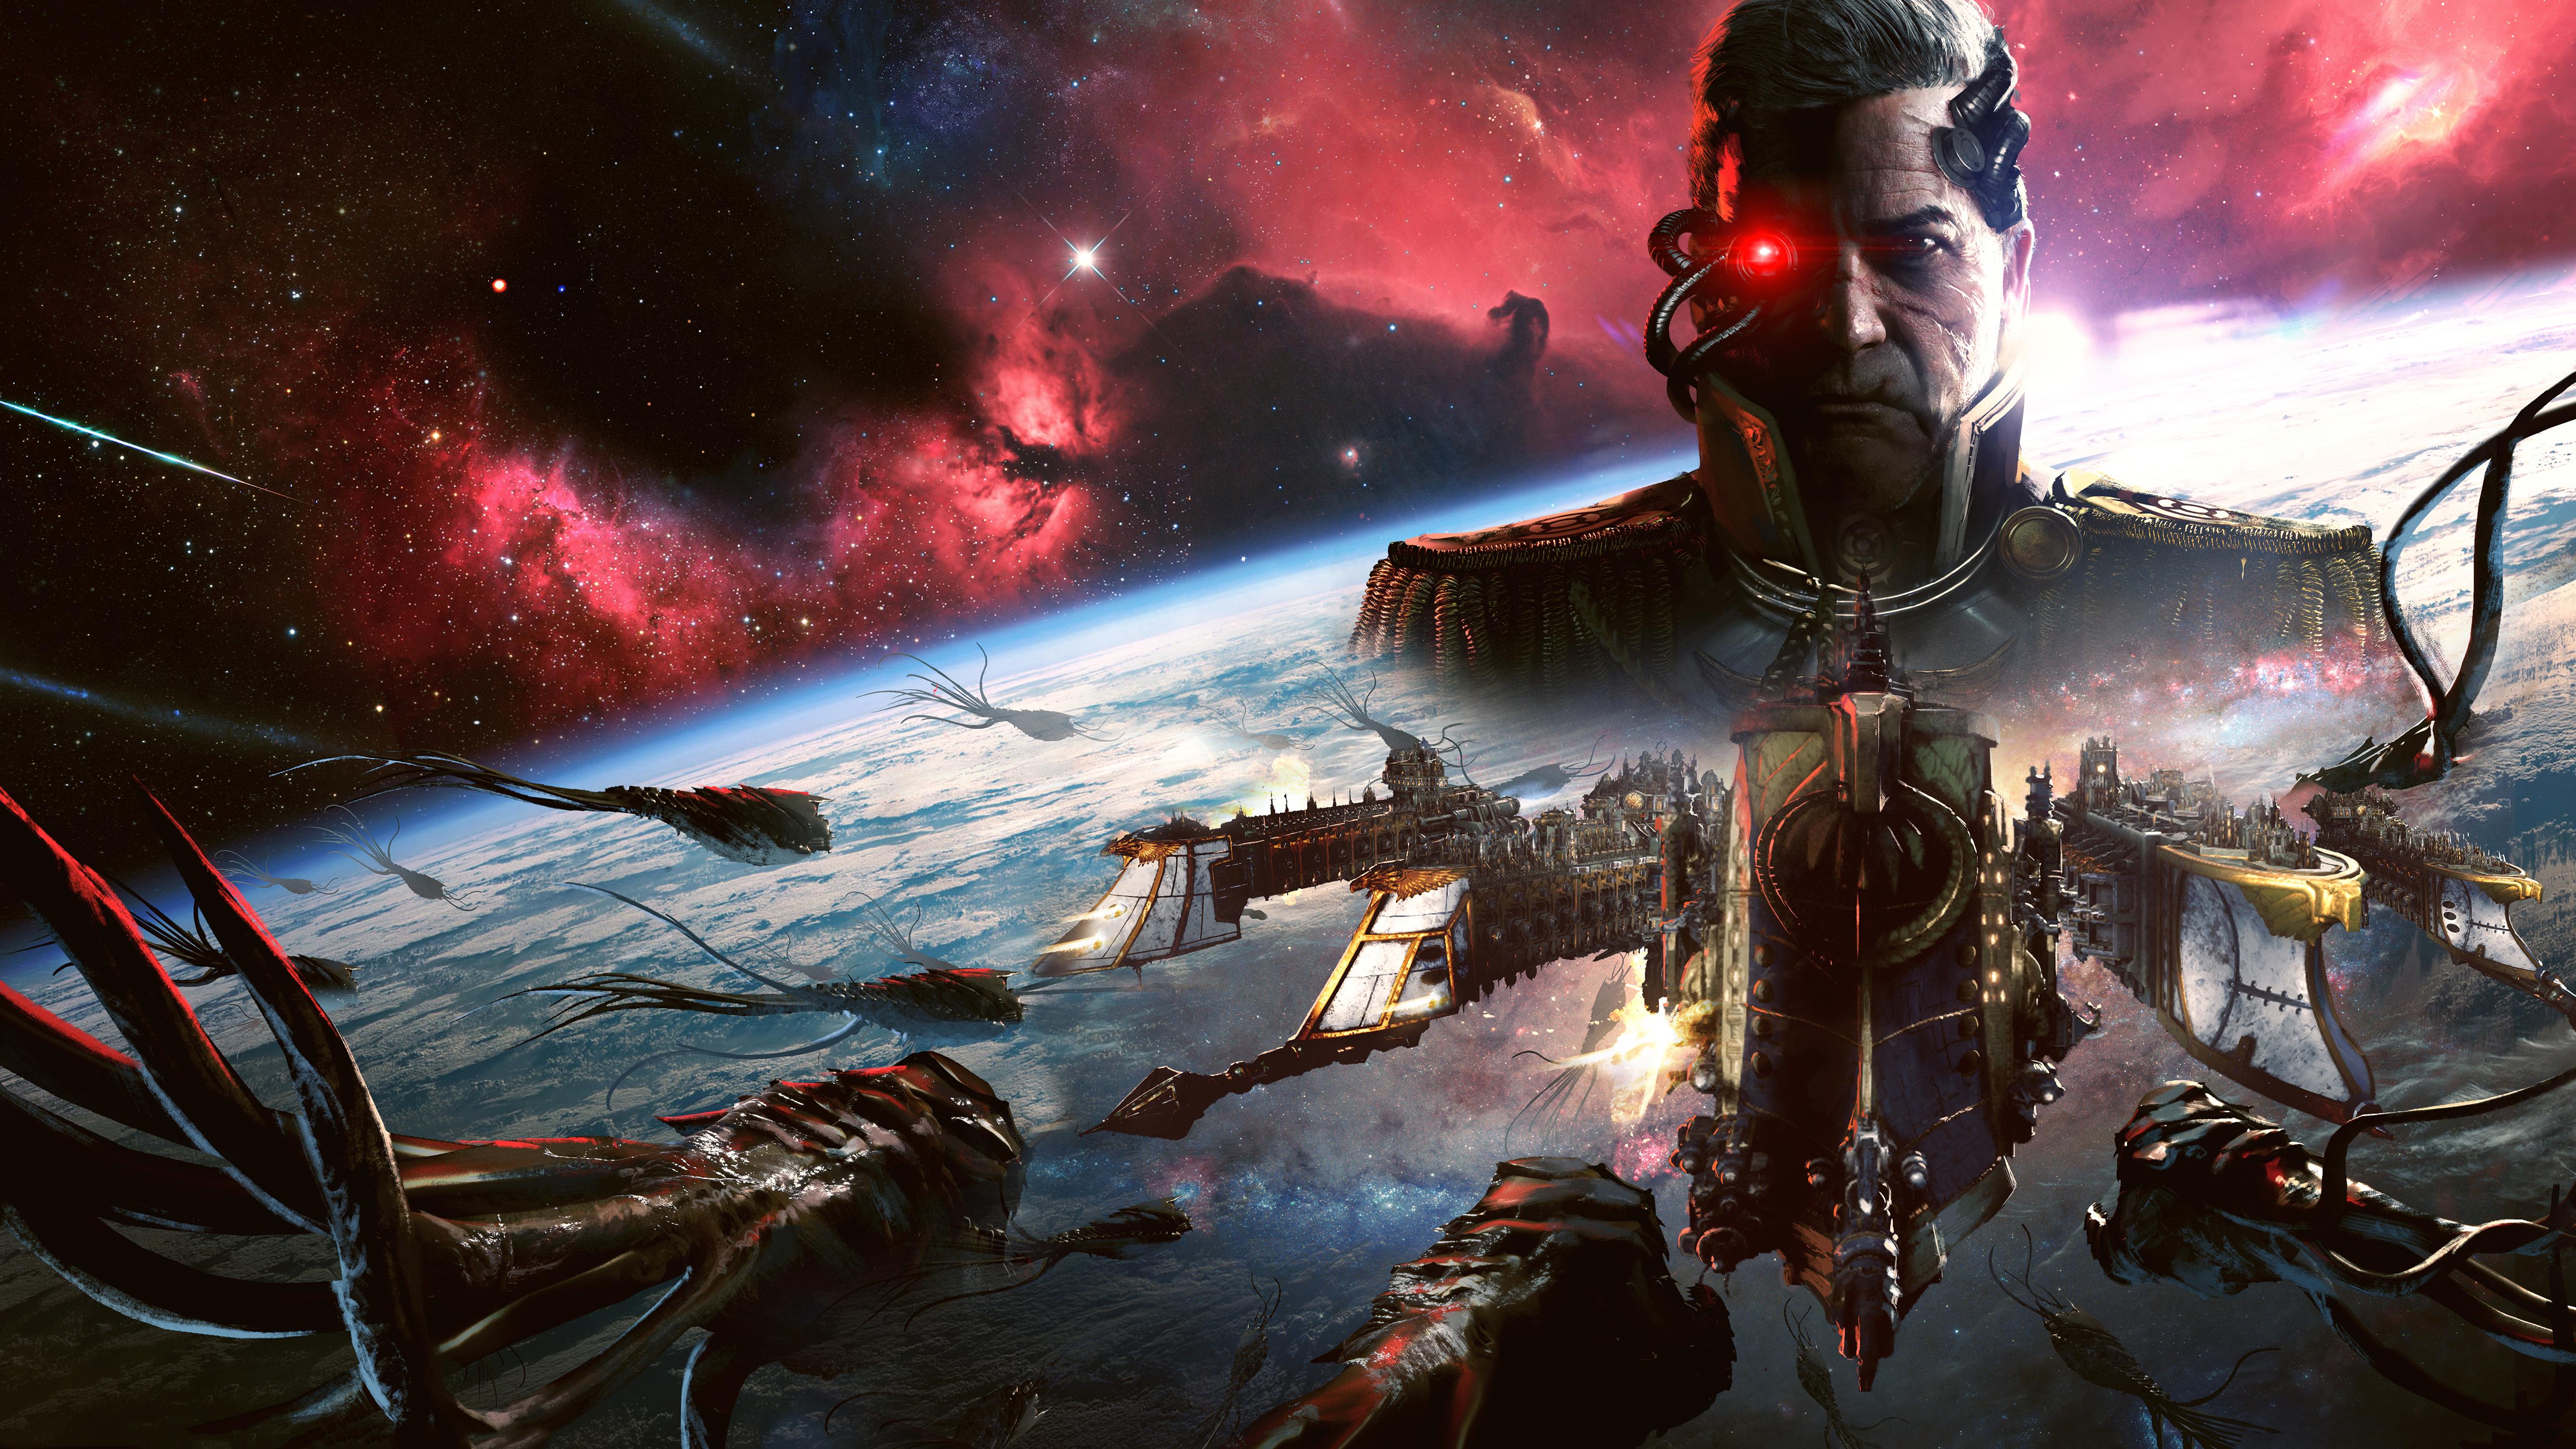 Battlefleet Gothic Armada 2 2018 5k Hd Games 4k Wallpapers Images